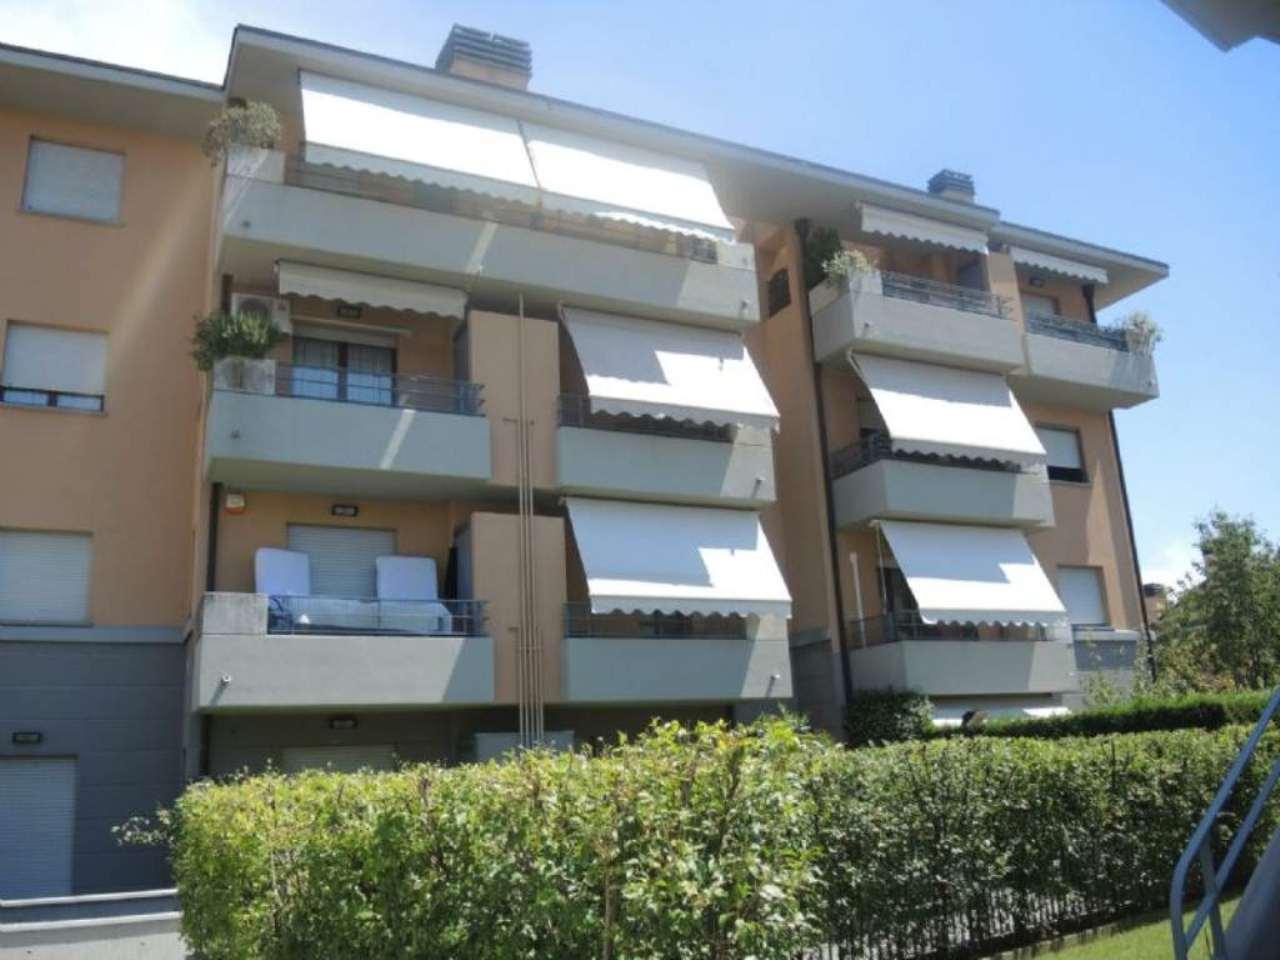 Bilocale Scanzorosciate Via Gorizia 10